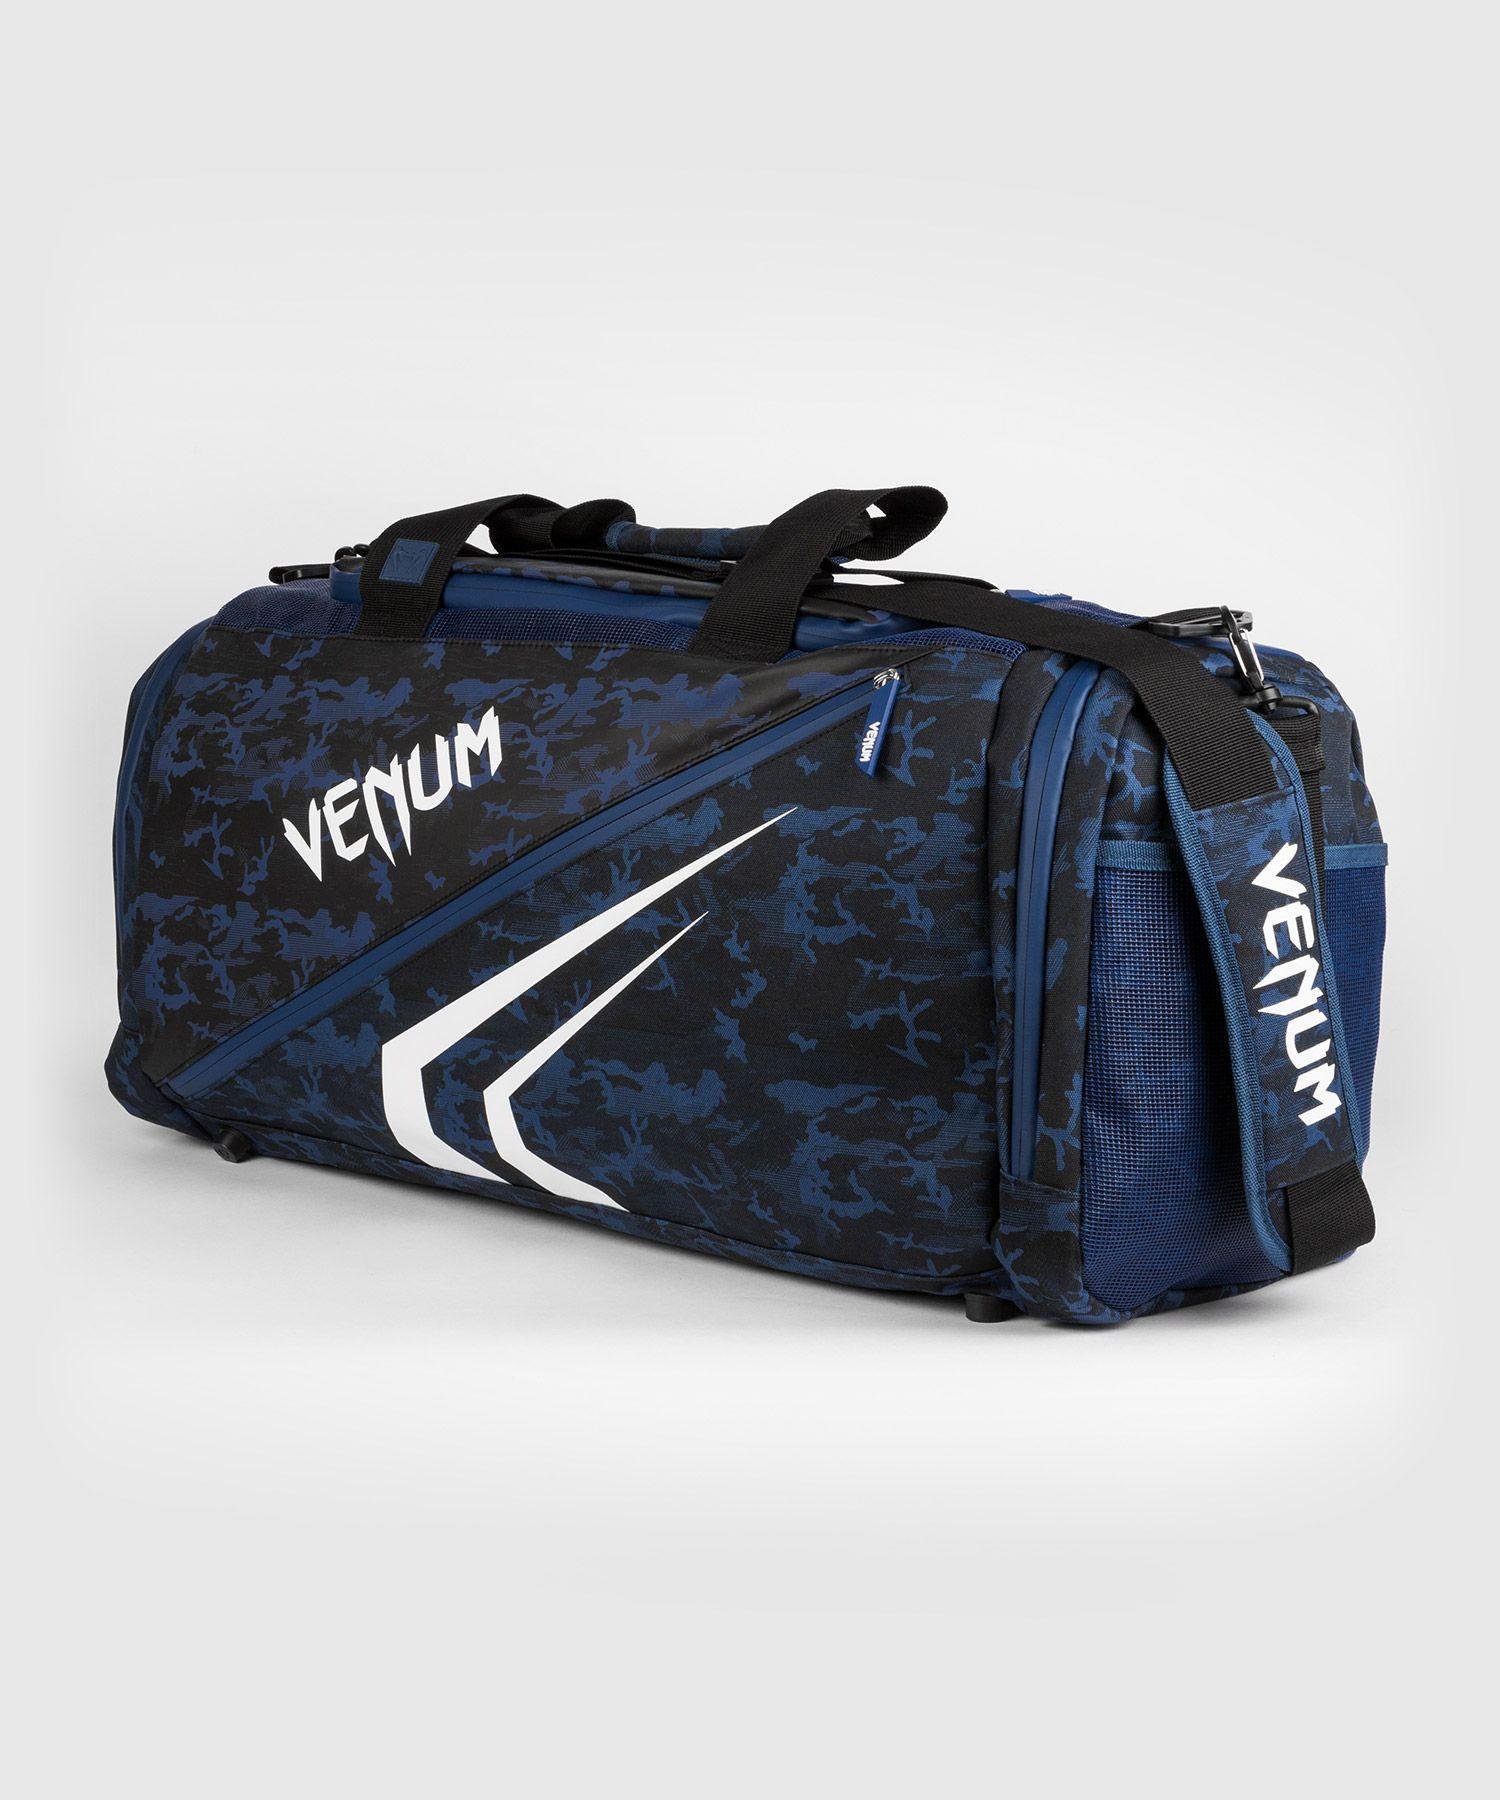 Bolsa de deporte Venum Trainer Lite Evo - Azul/Blanco